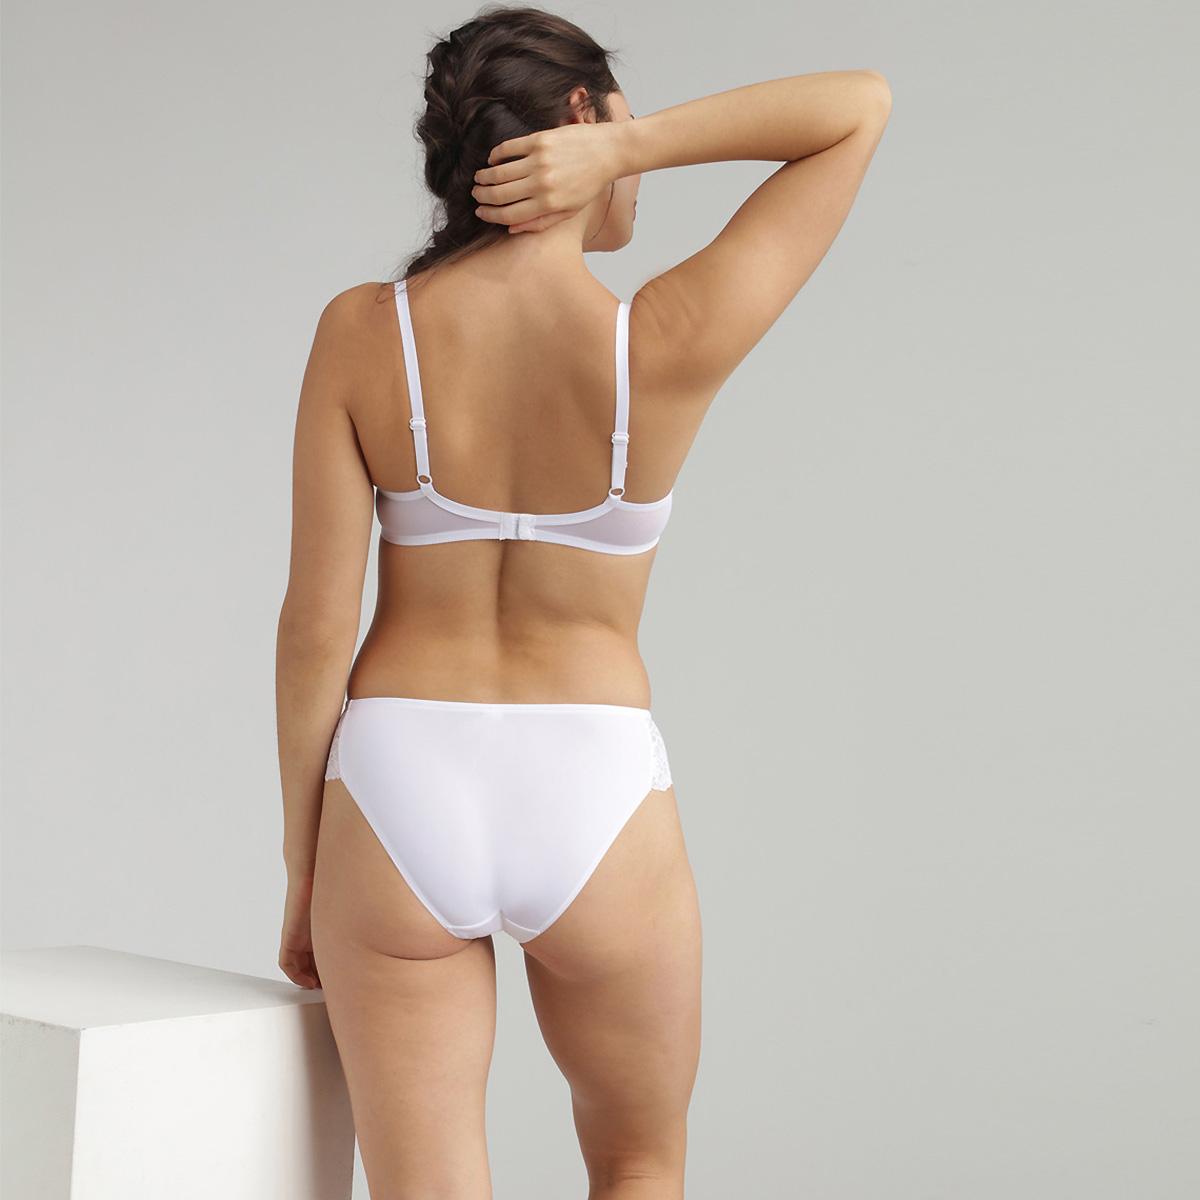 Soutien-gorge dentelle corbeille blanc Essential Elegance, , PLAYTEX